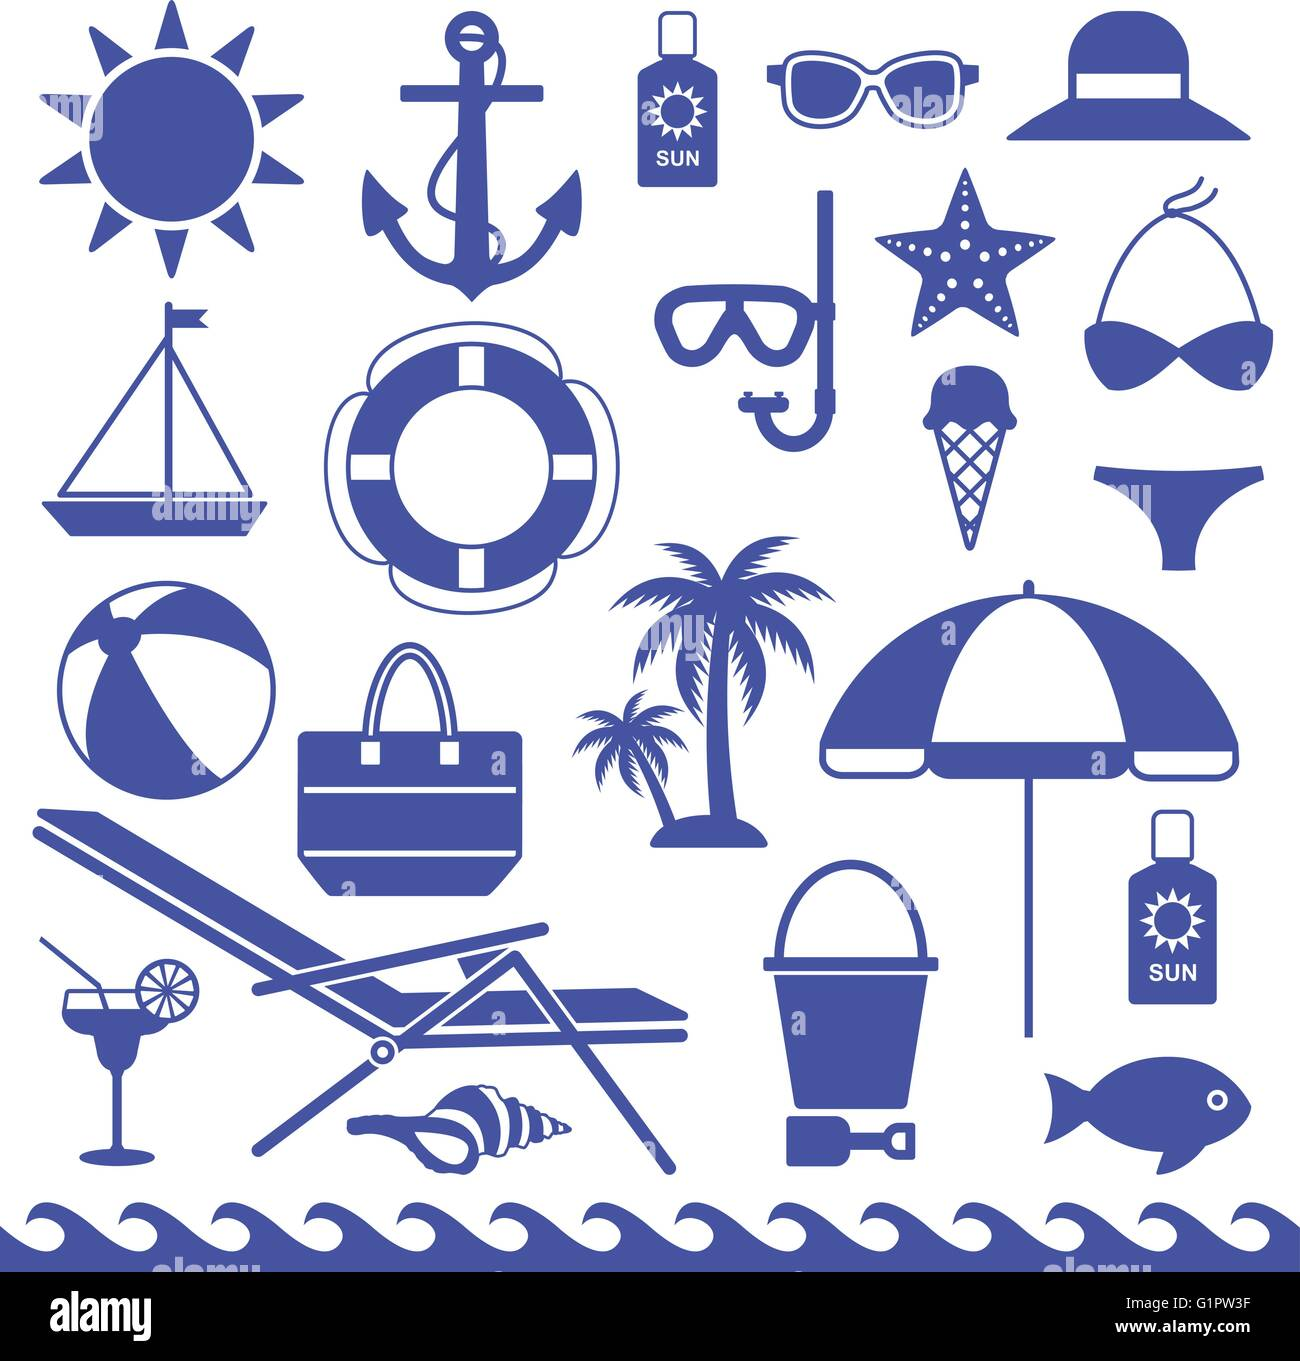 Sea Symbols Silhouette Icons Vector Set 2 Stock Vector Art